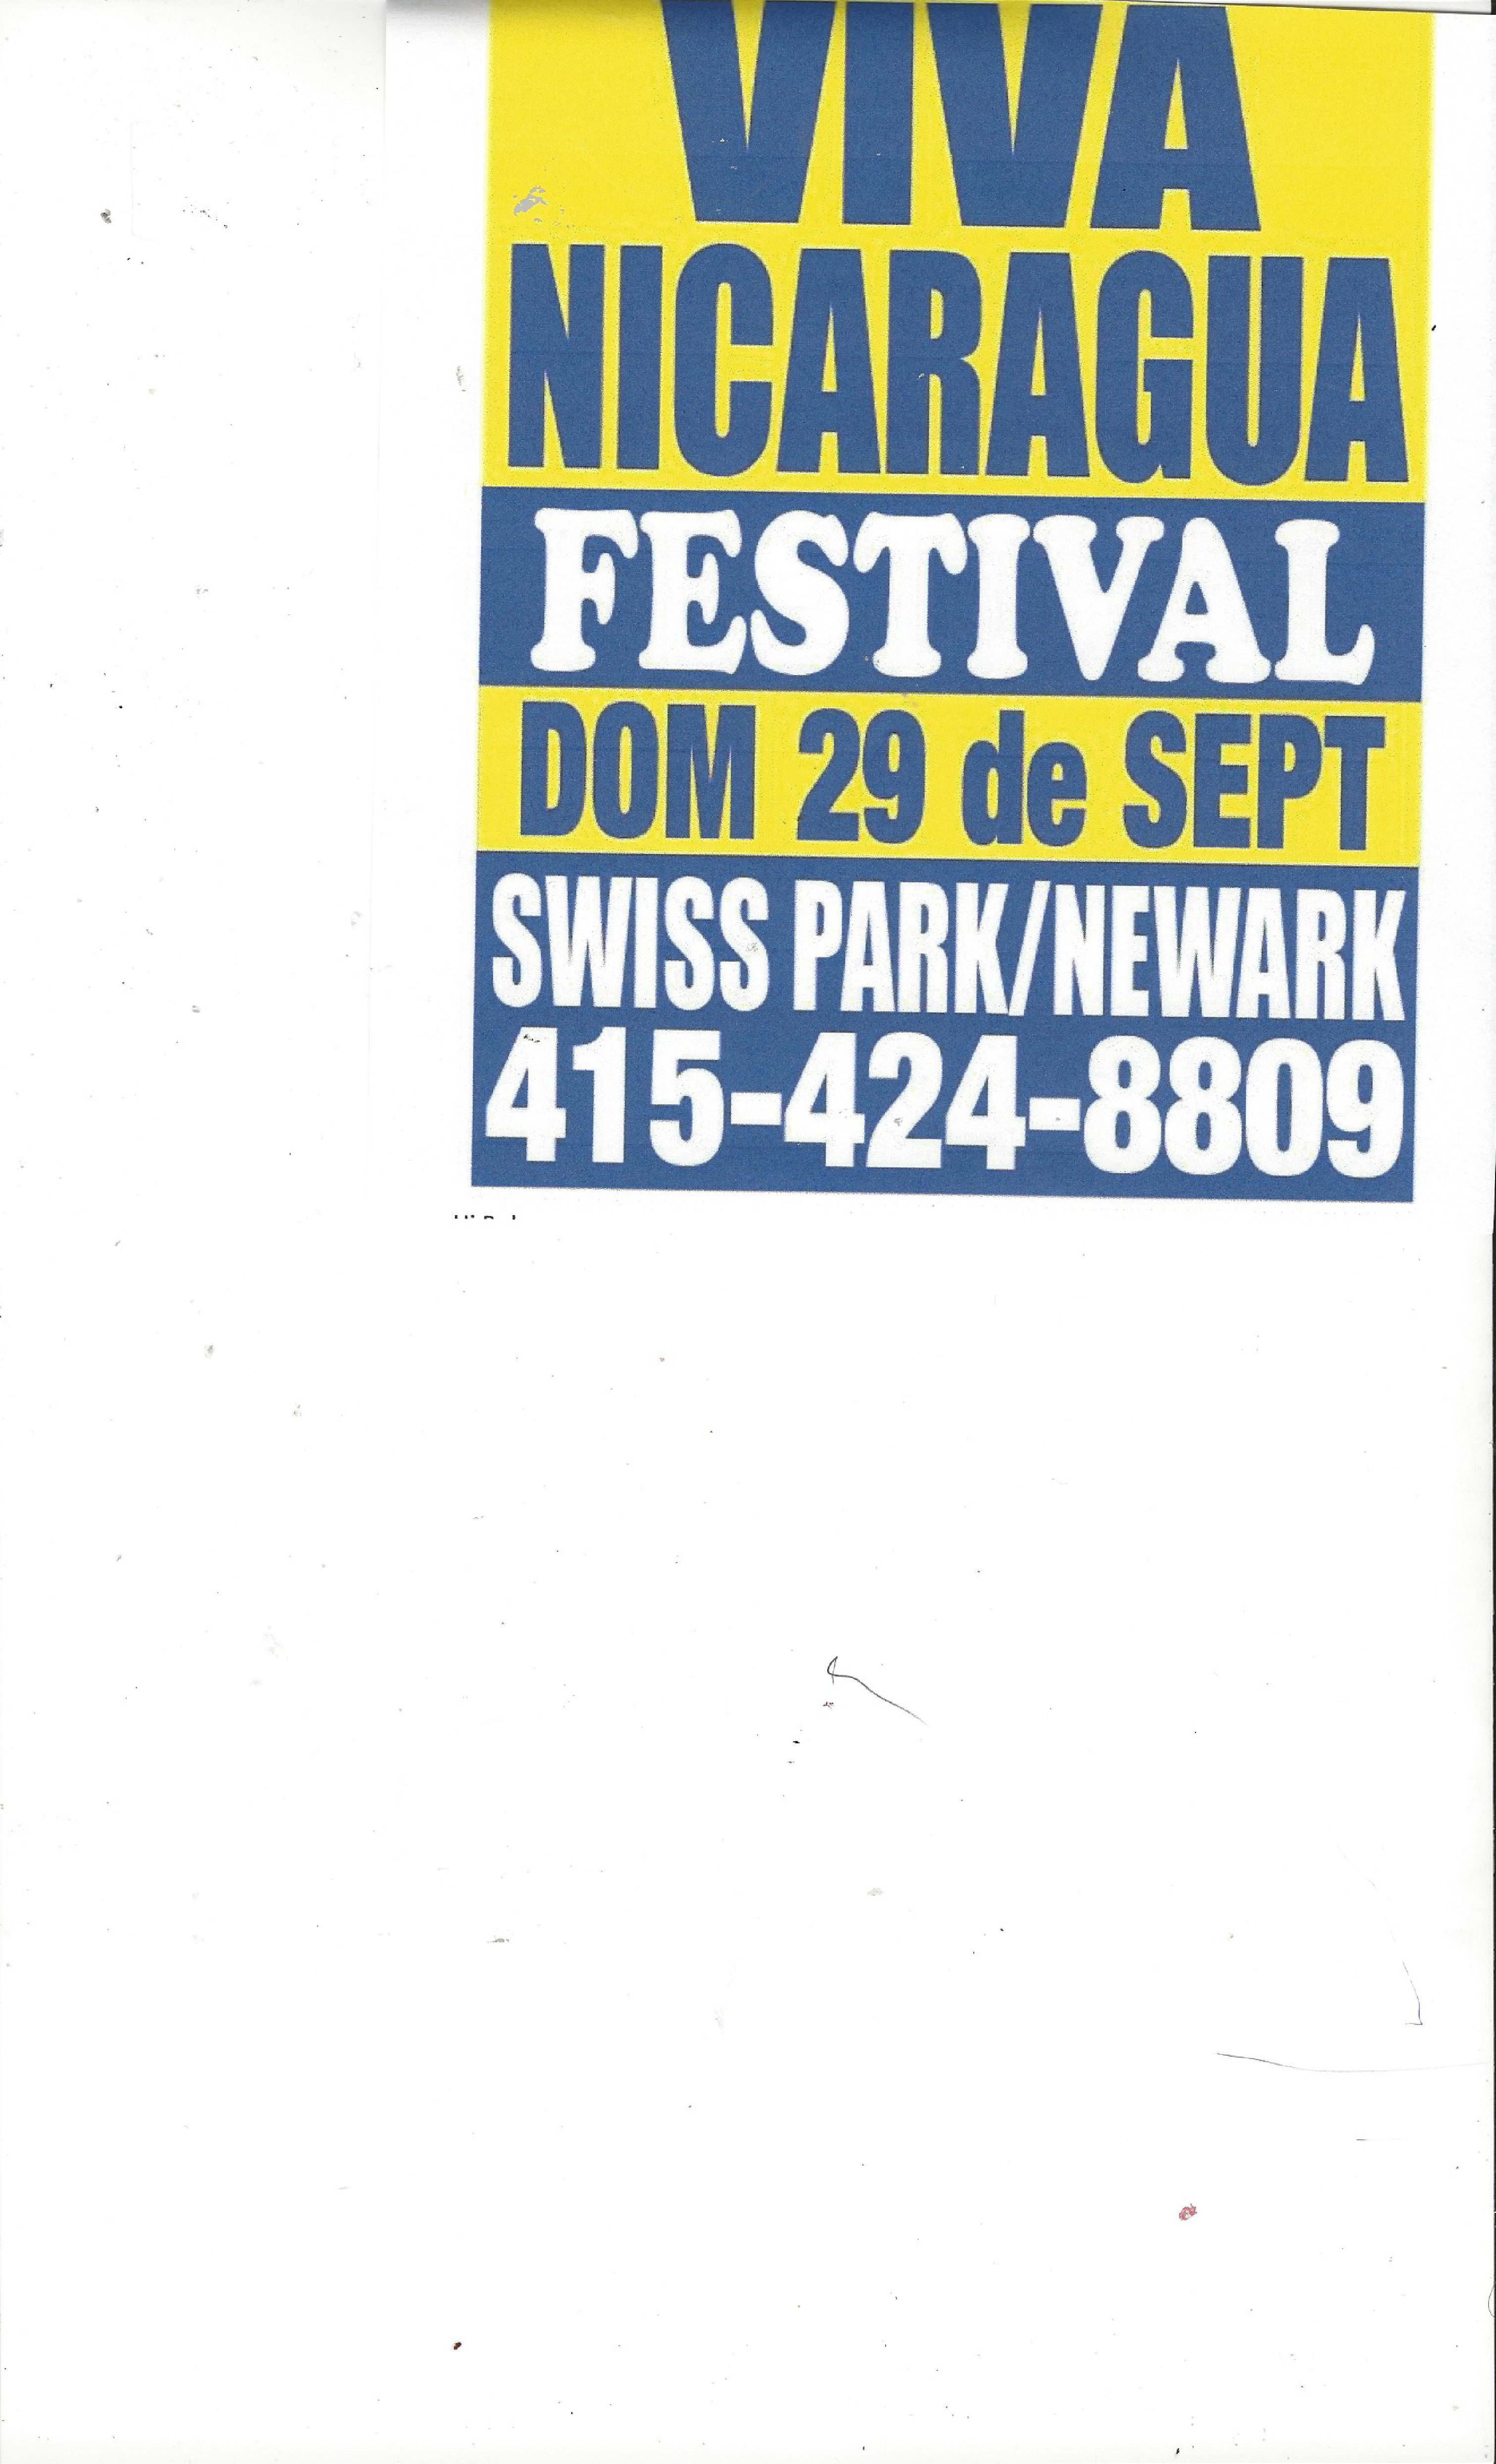 NICARAGUA FESTIVAL